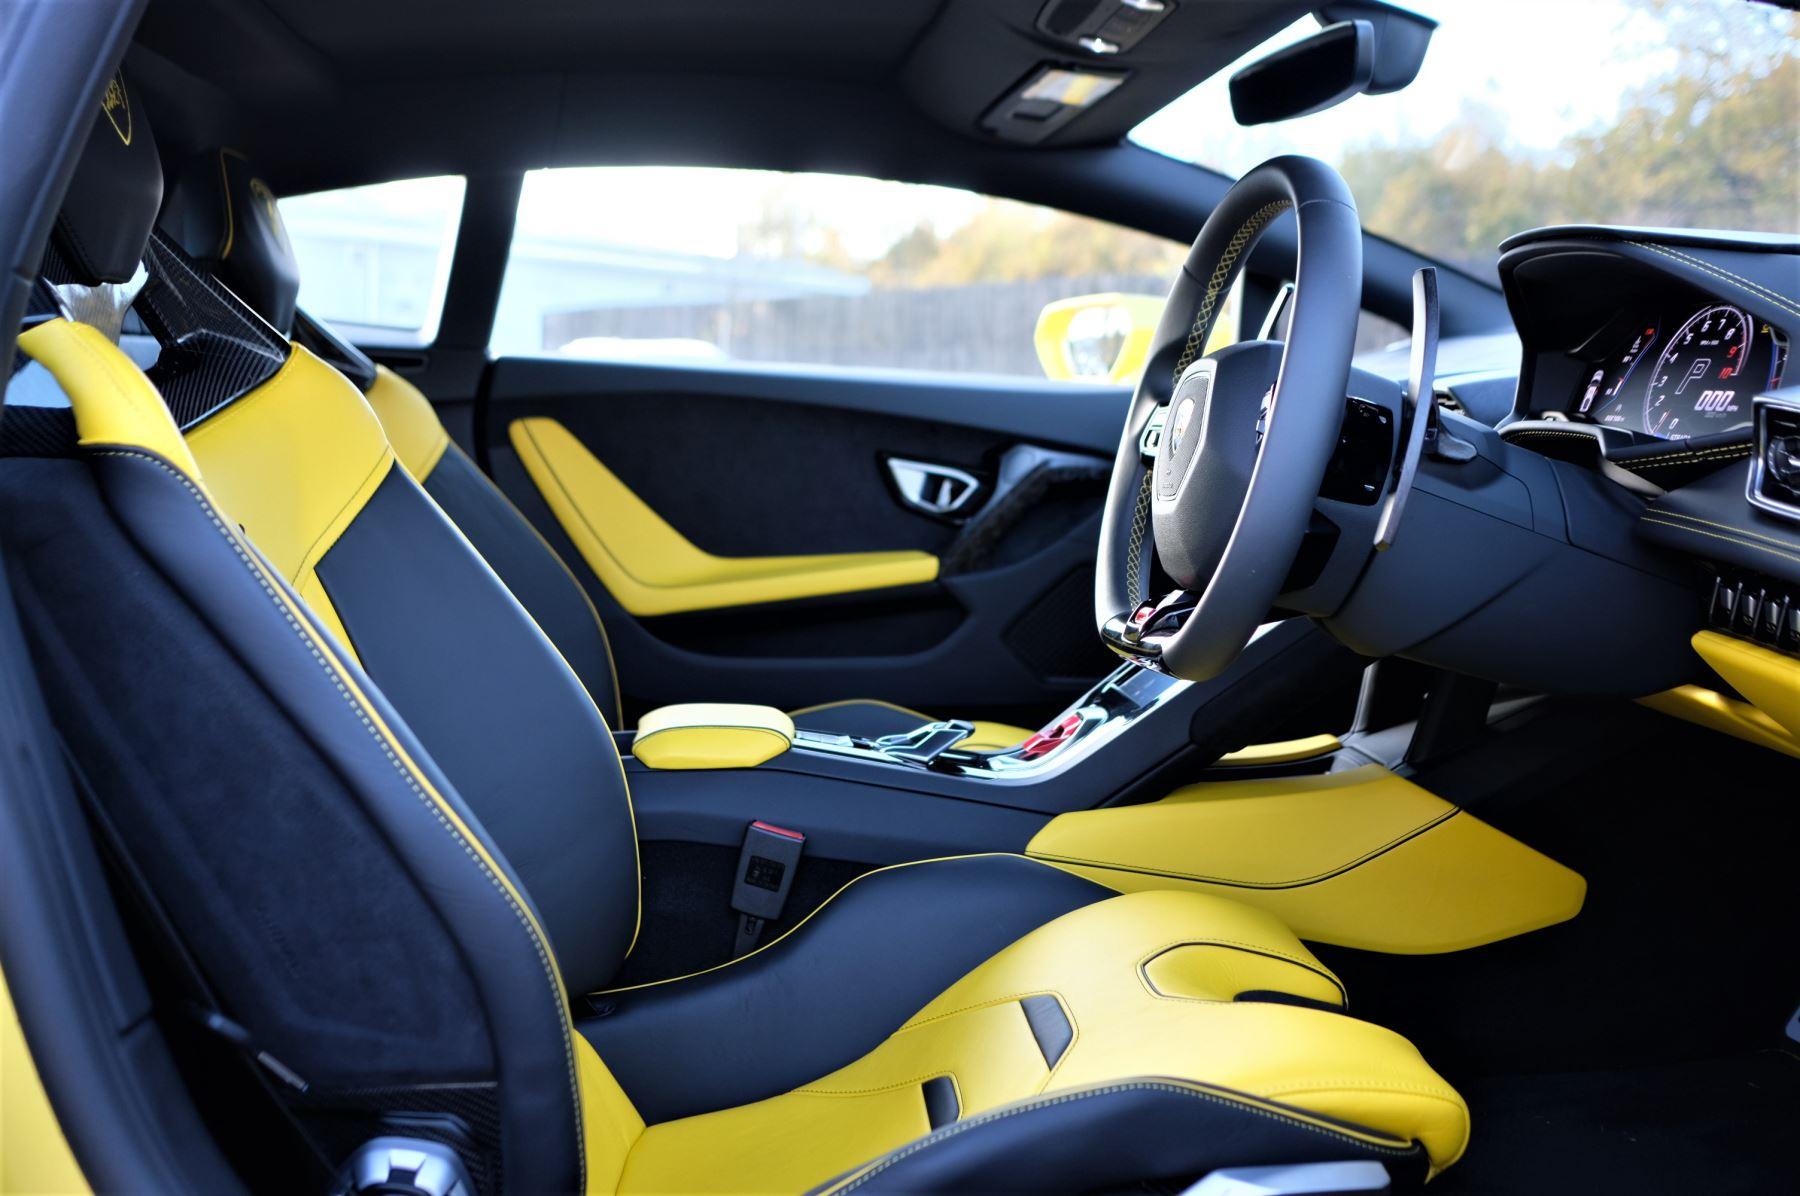 Lamborghini Huracan EVO 5.2 V10 610 2dr Auto RWD image 6